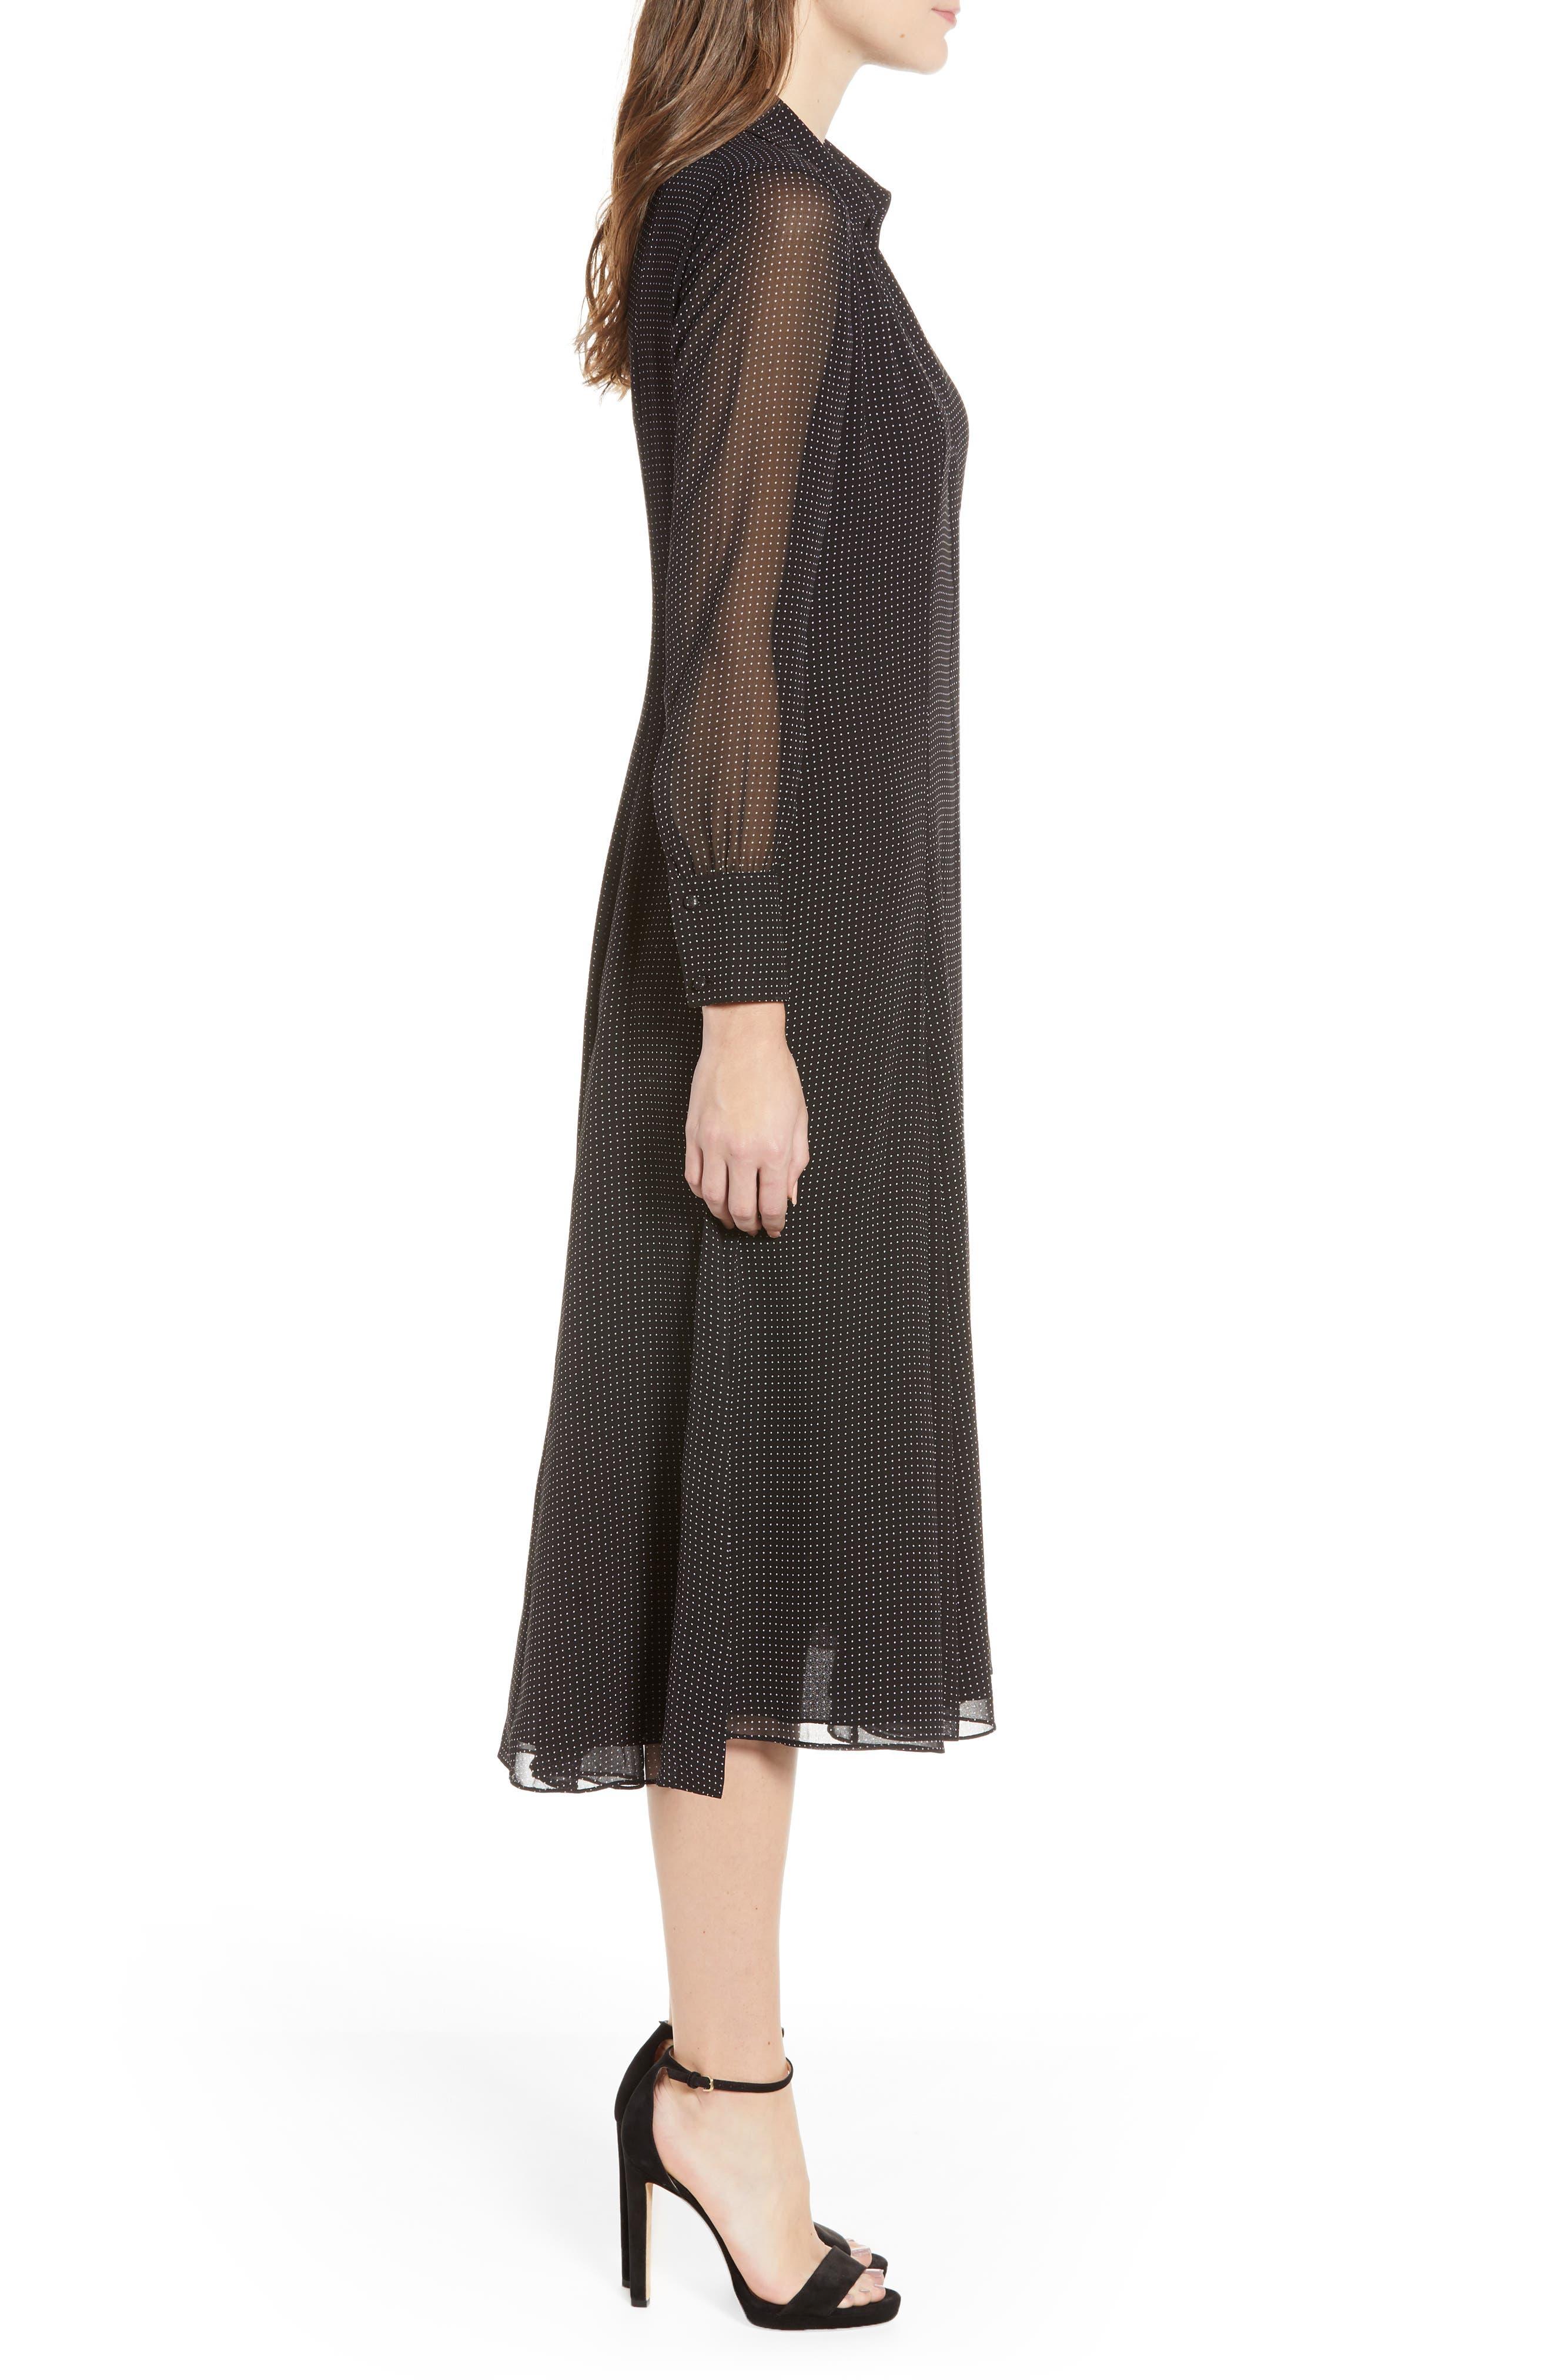 REBECCA MINKOFF,                             Kimberly Dot Sheer Sleeve Dress,                             Alternate thumbnail 4, color,                             BLACK/ WHITE